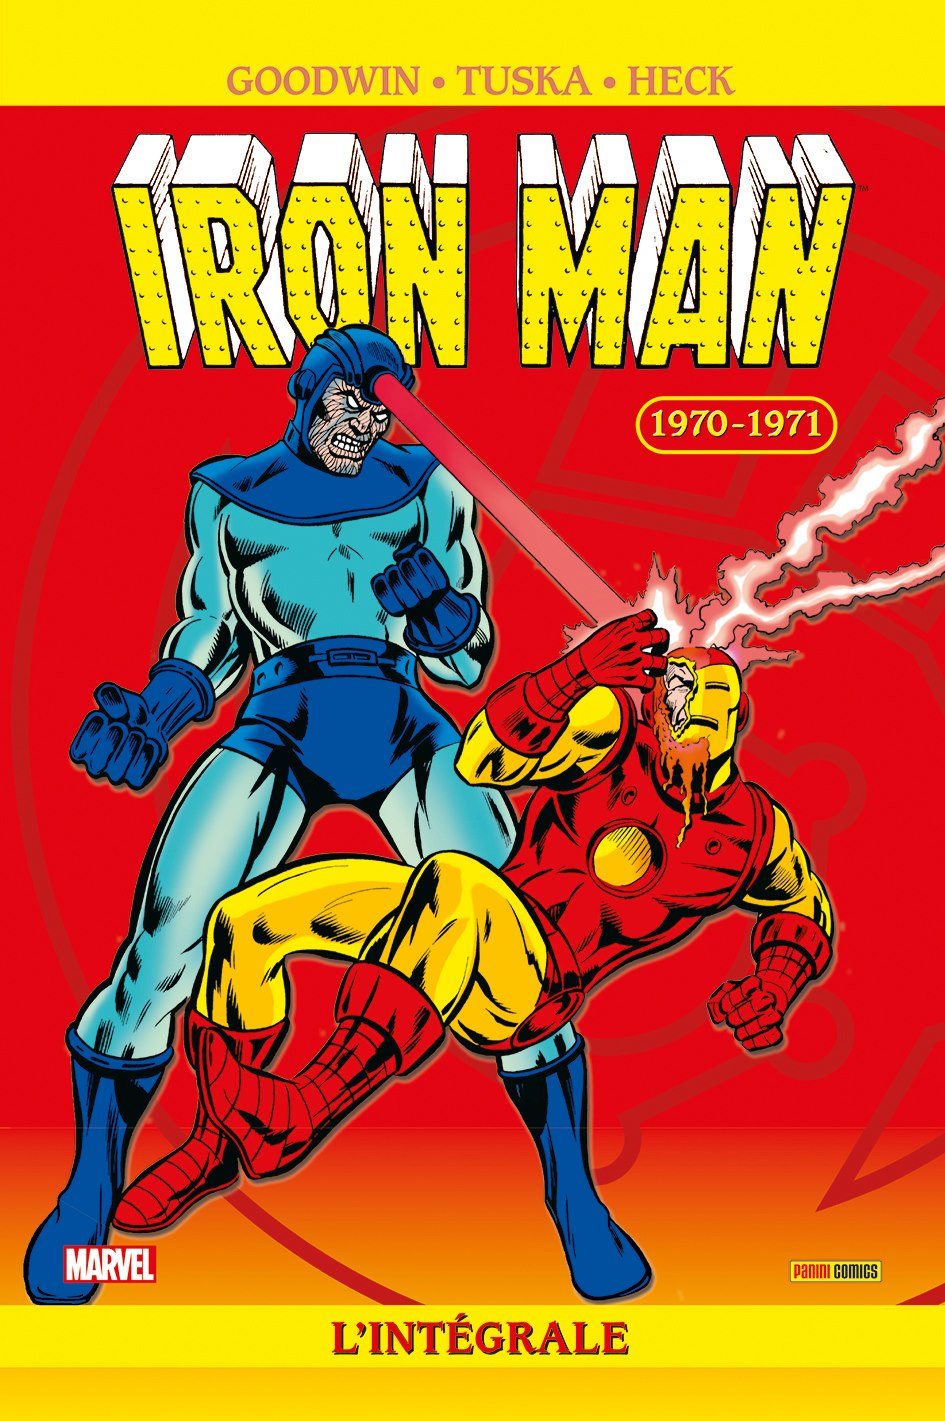 Iron Man l'Intégrale 1970-1971